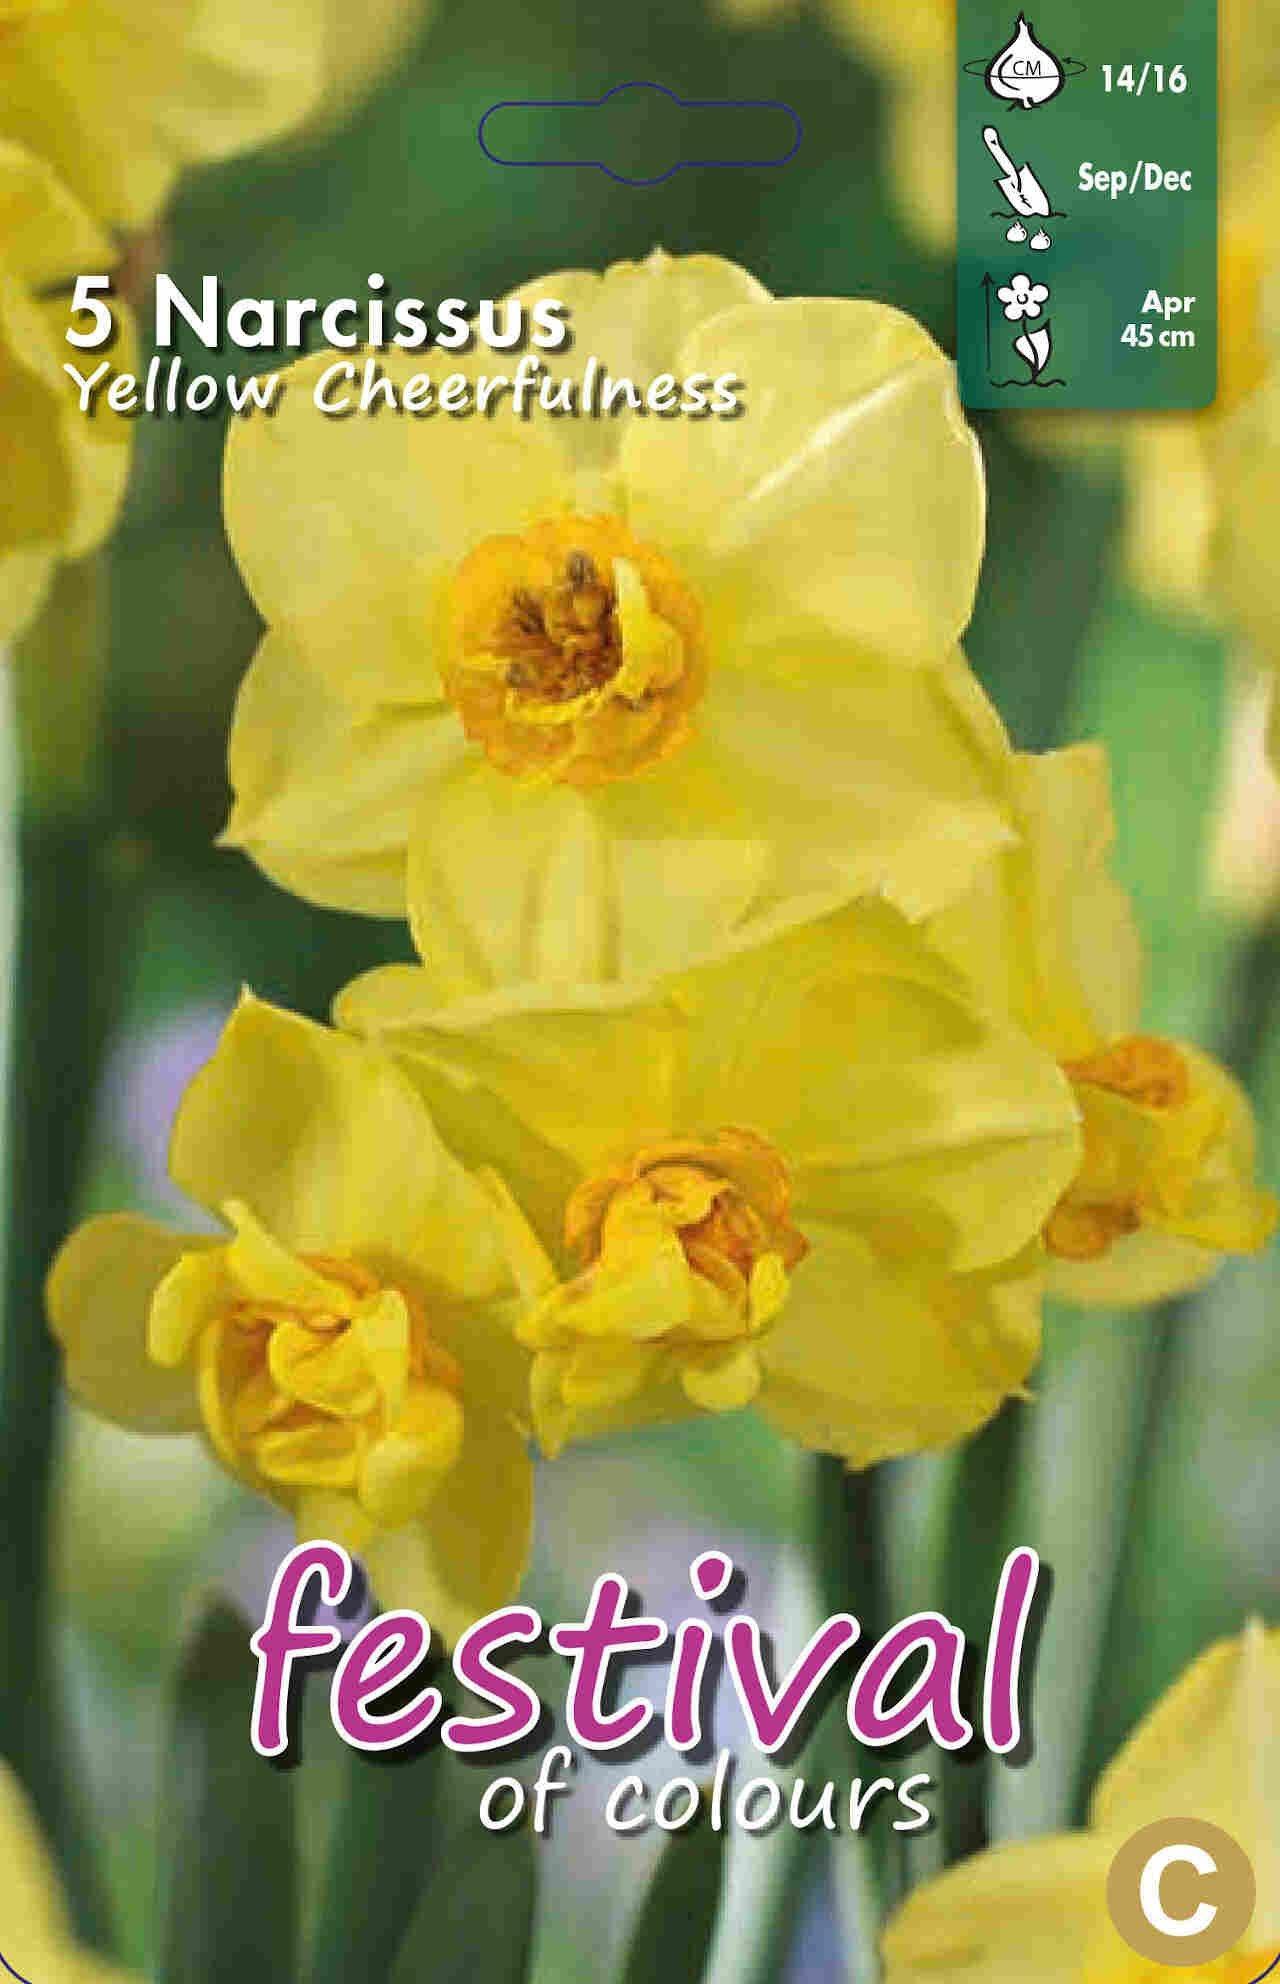 Påskelilje løg - Narcissus Yellow Cheerfulness 14/16